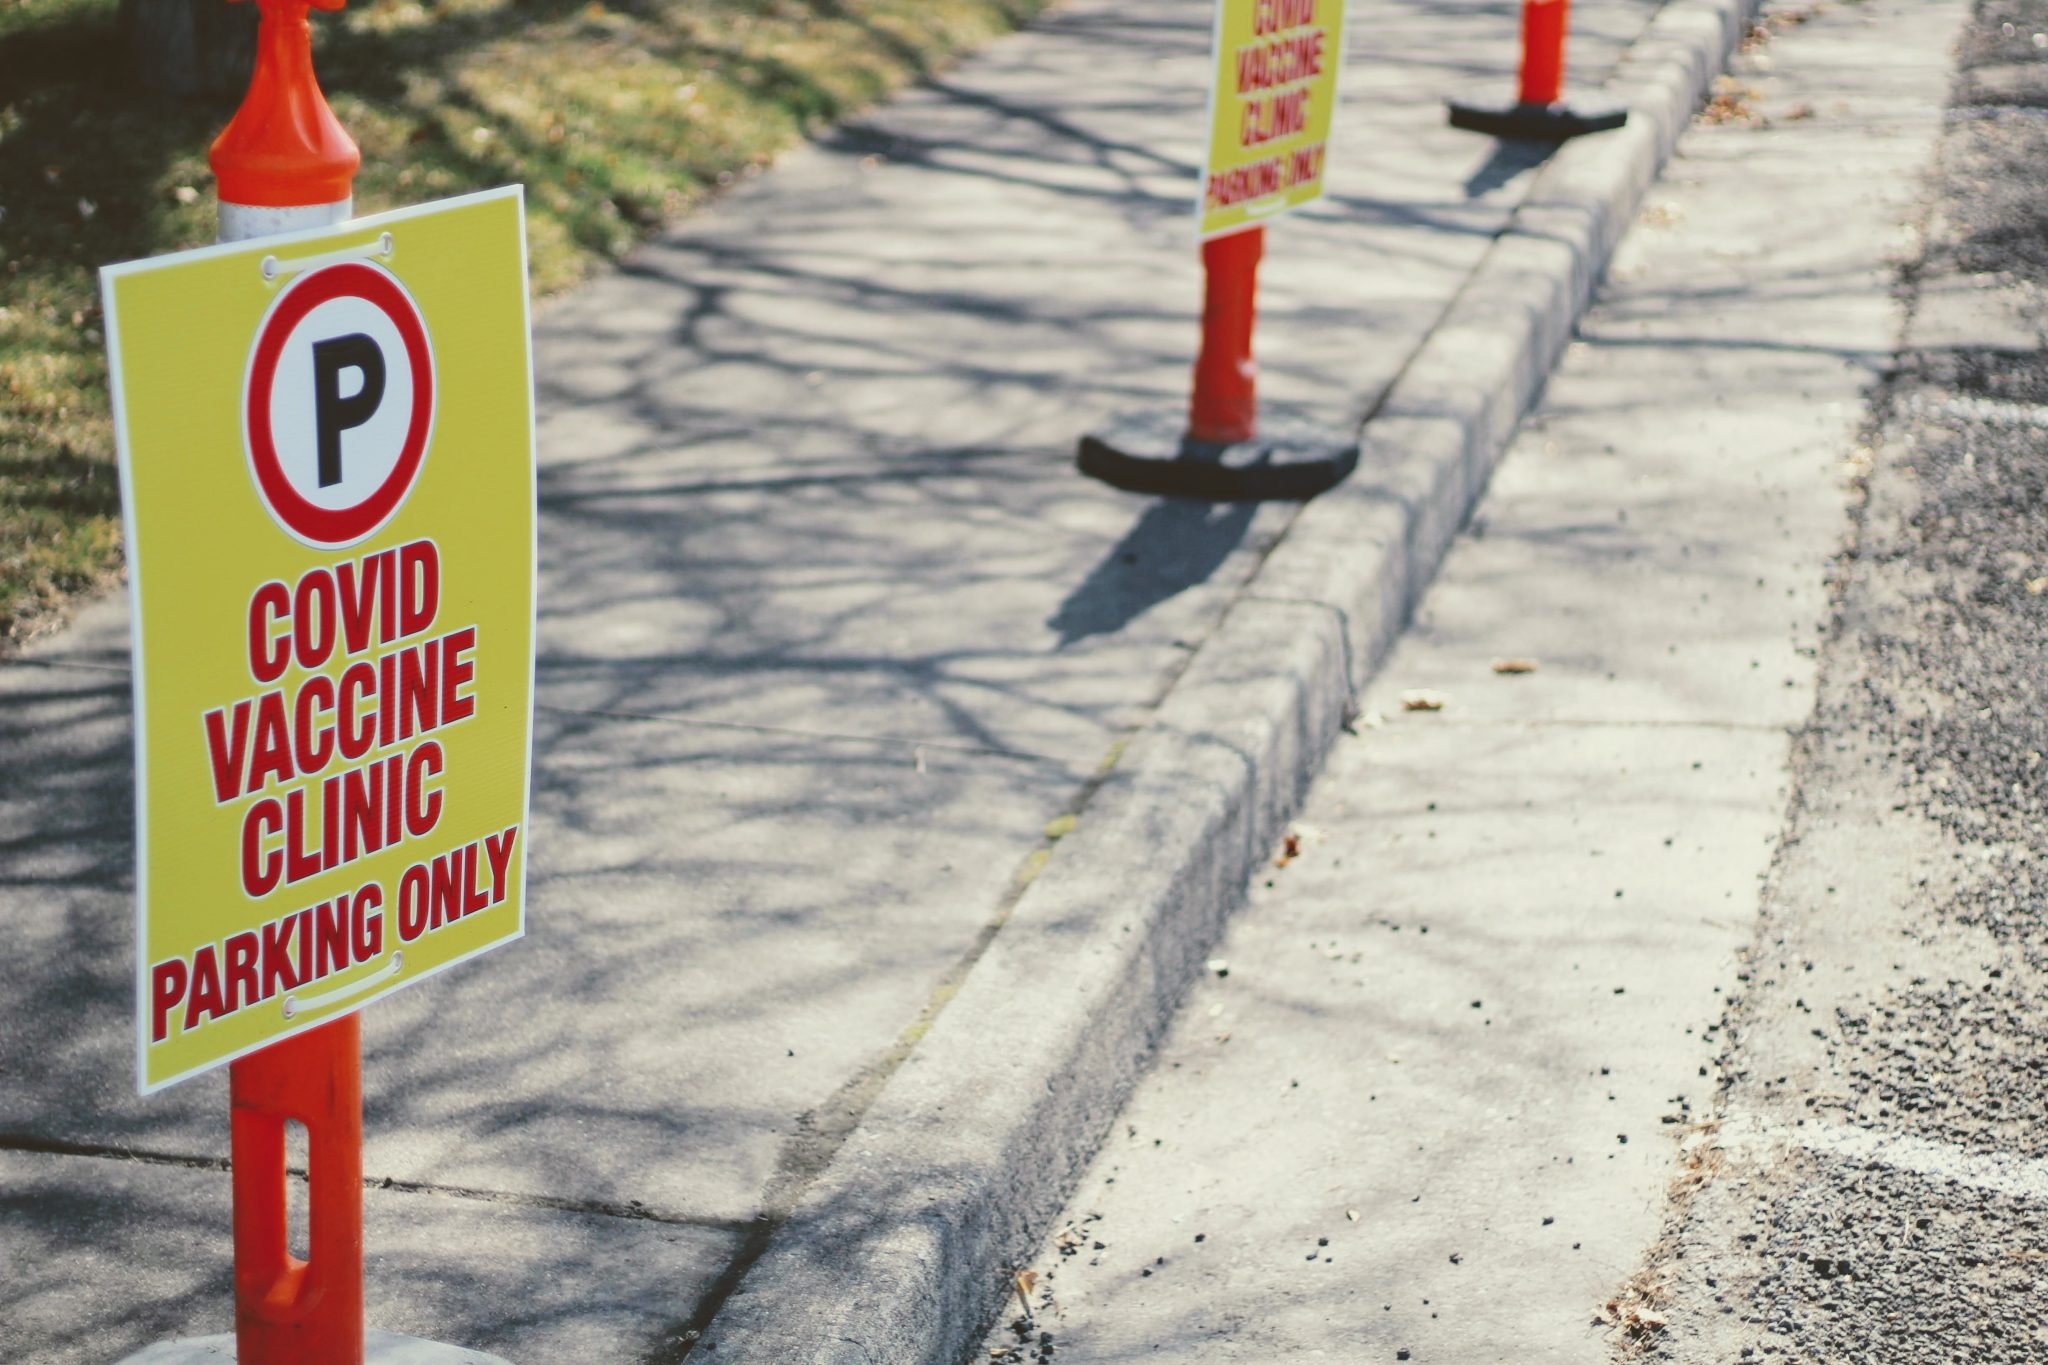 Neighborhood vaccine / parking cones / PHOTO BY JOSHUA HOEHNE ON UNSPLASH